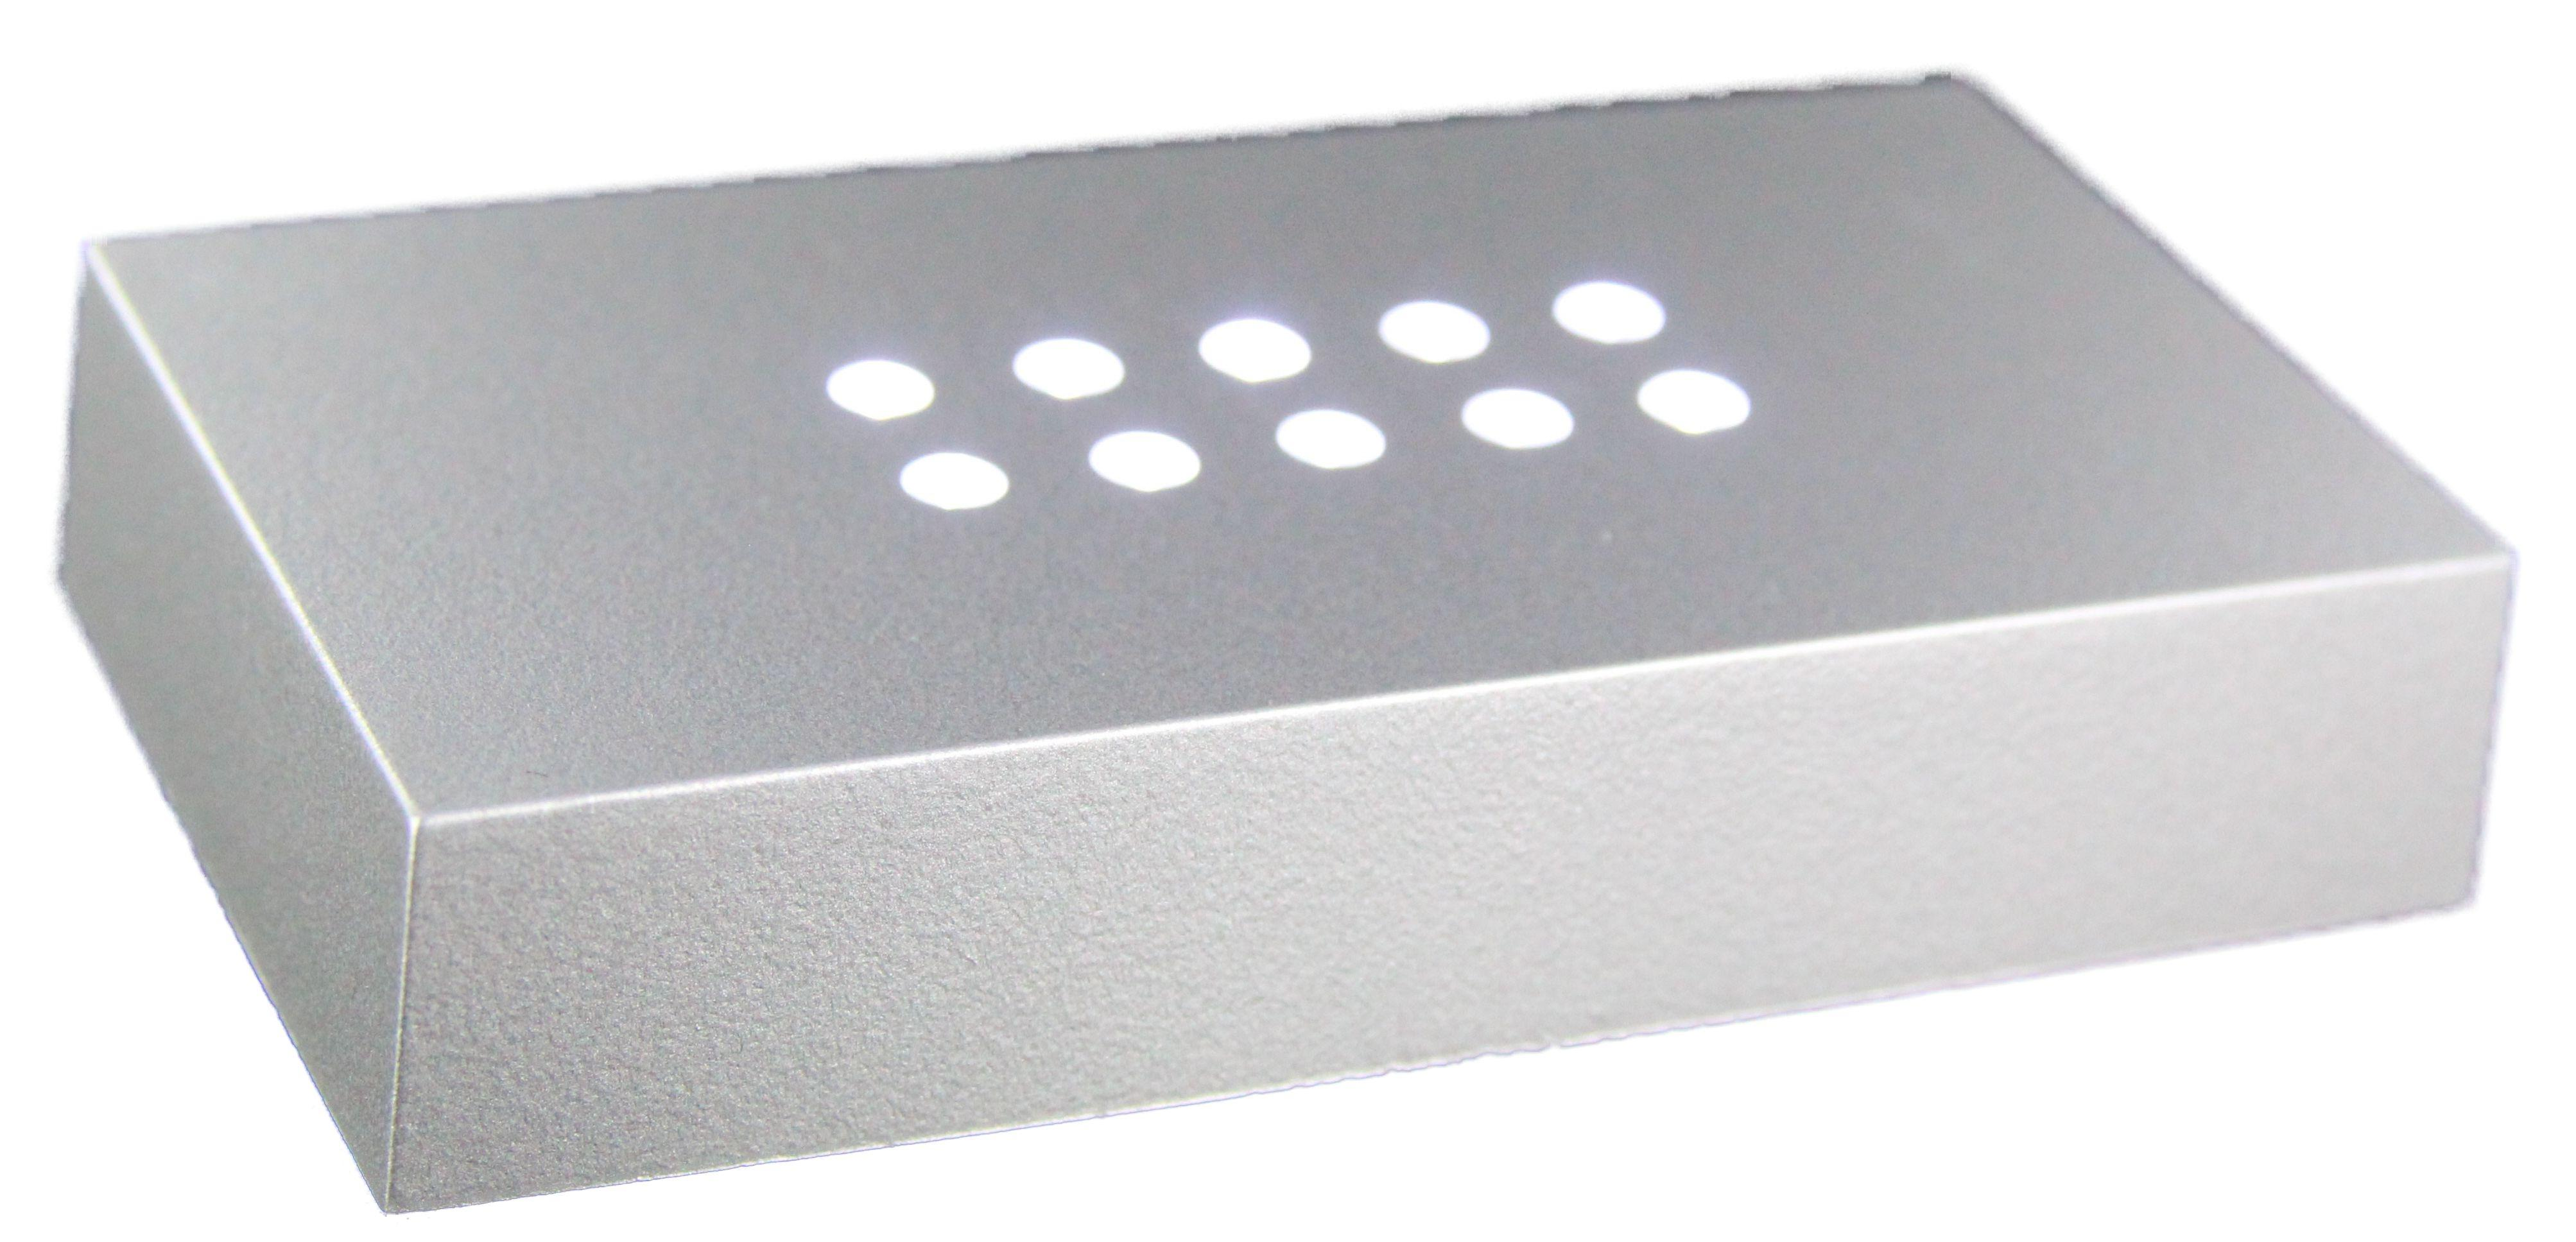 LED LEUCHTSOCKEL   10 weiße LED   100x60x20mm   Farbe Silber